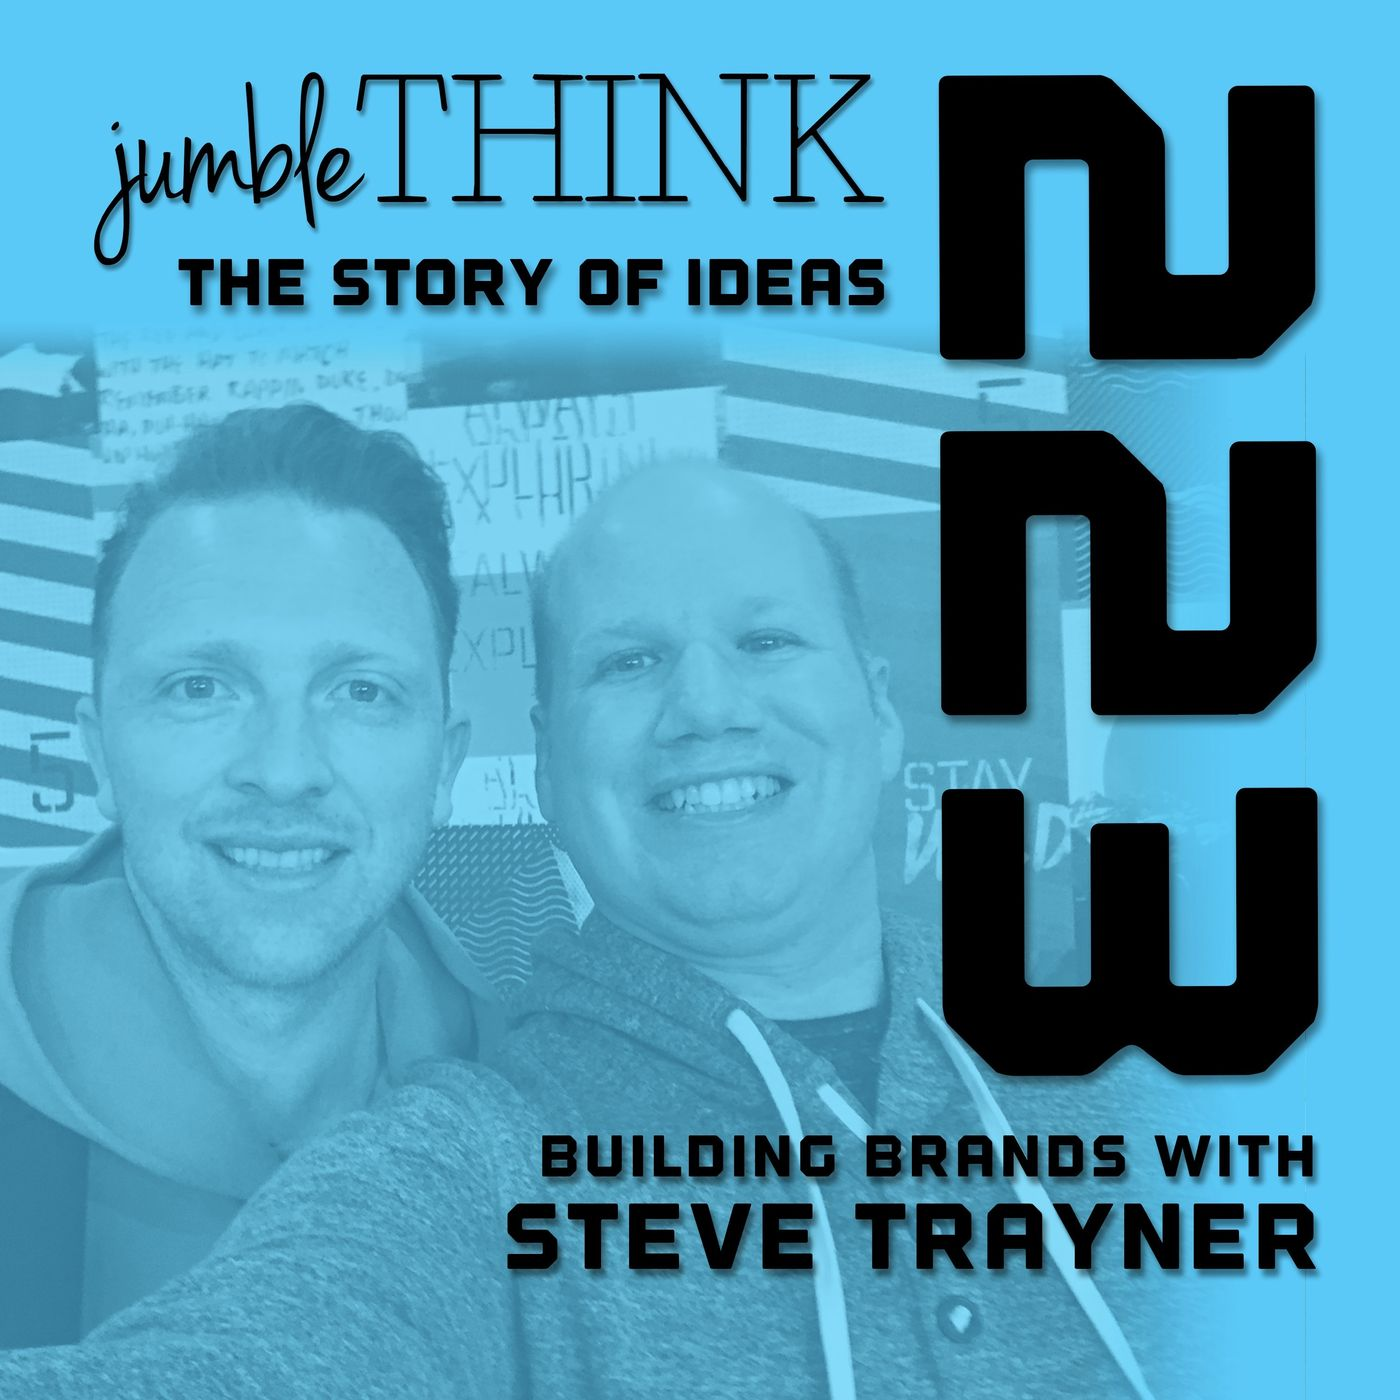 Building Brands with Steve Trayner